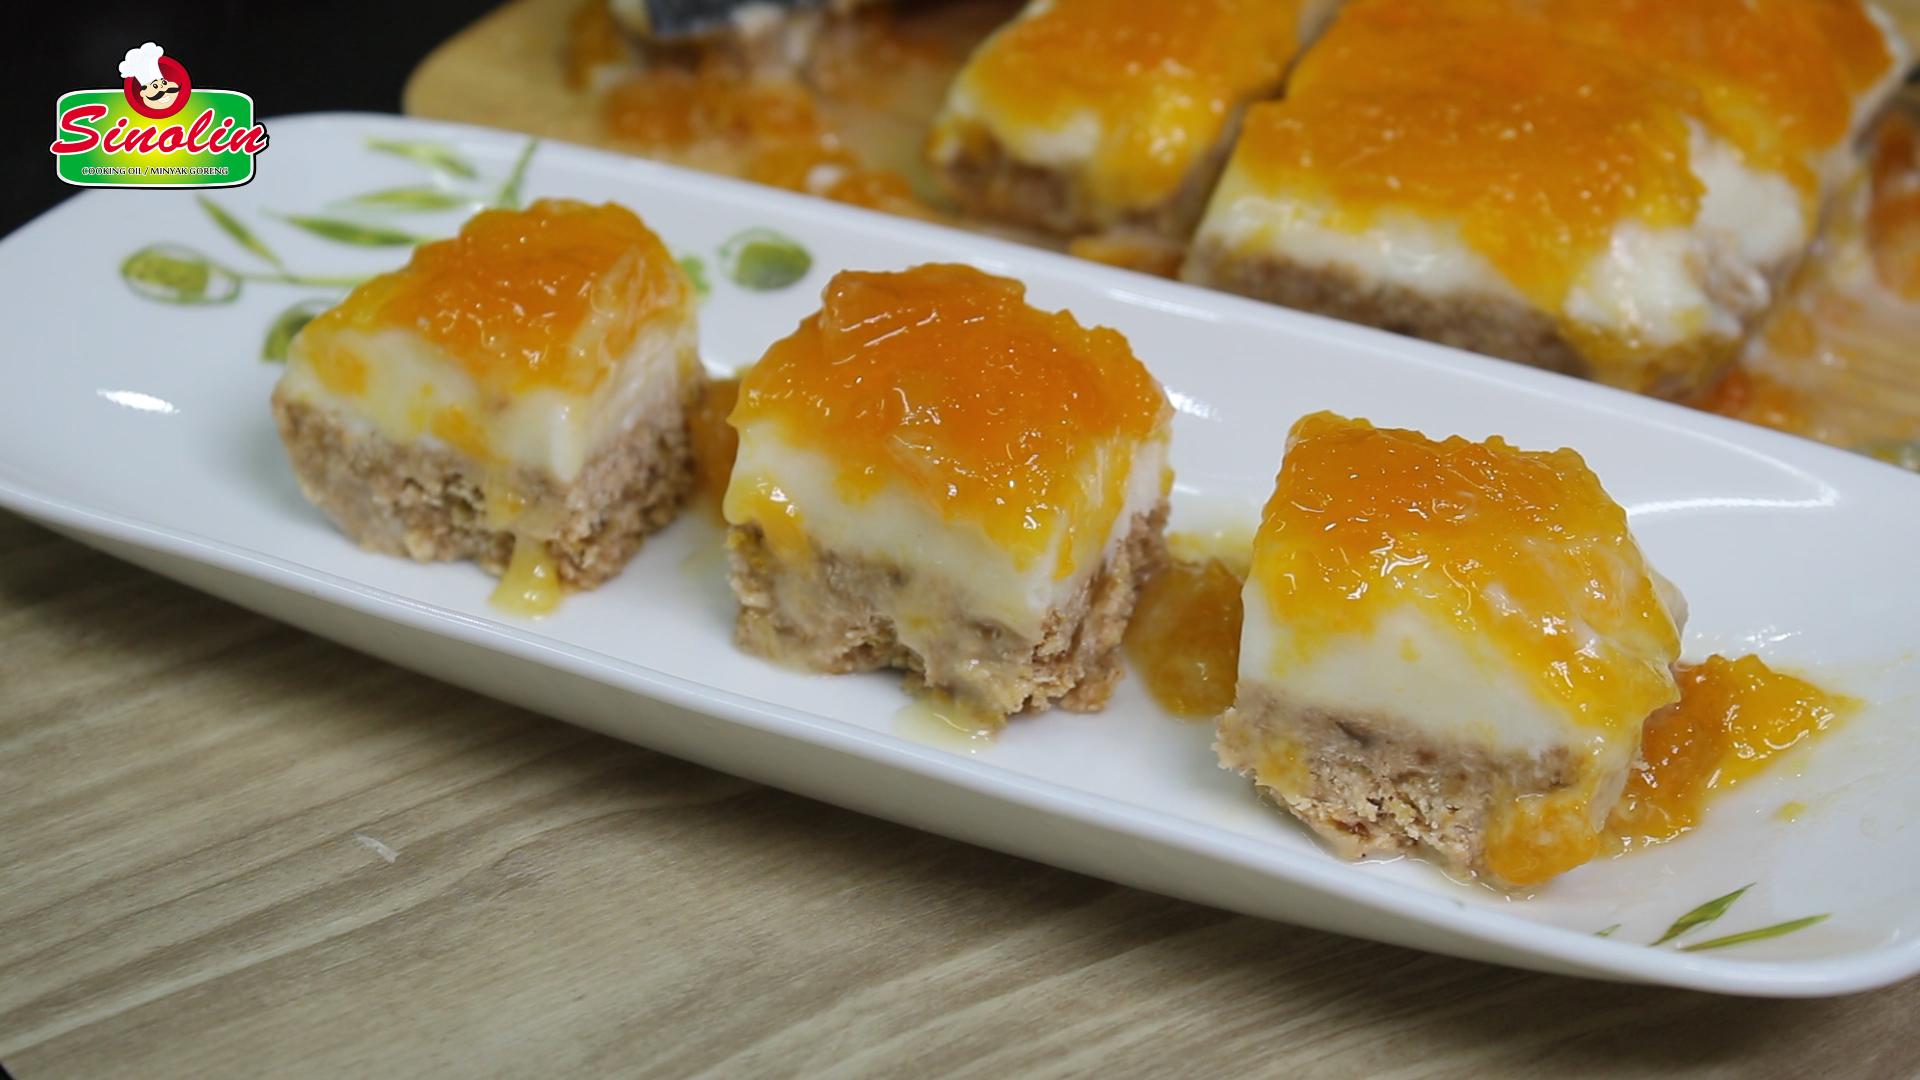 Frozen Yogurt Breakfast Bars By Dapur Sinolin